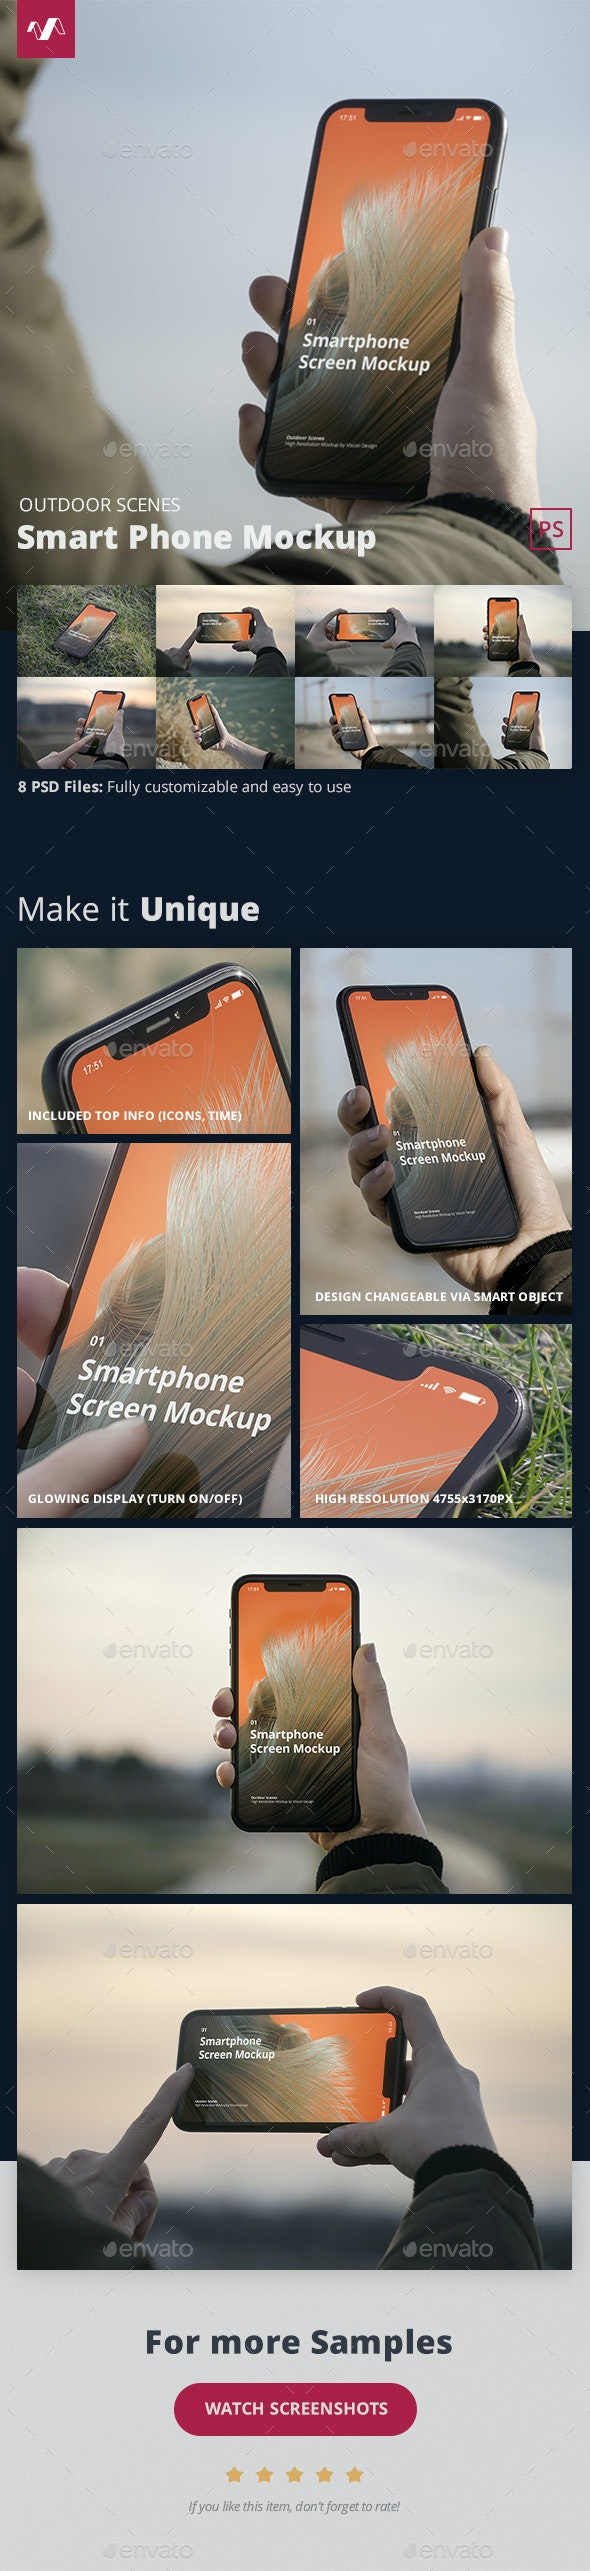 Phone Mockup Outdoor Scenes - Mobile Displays